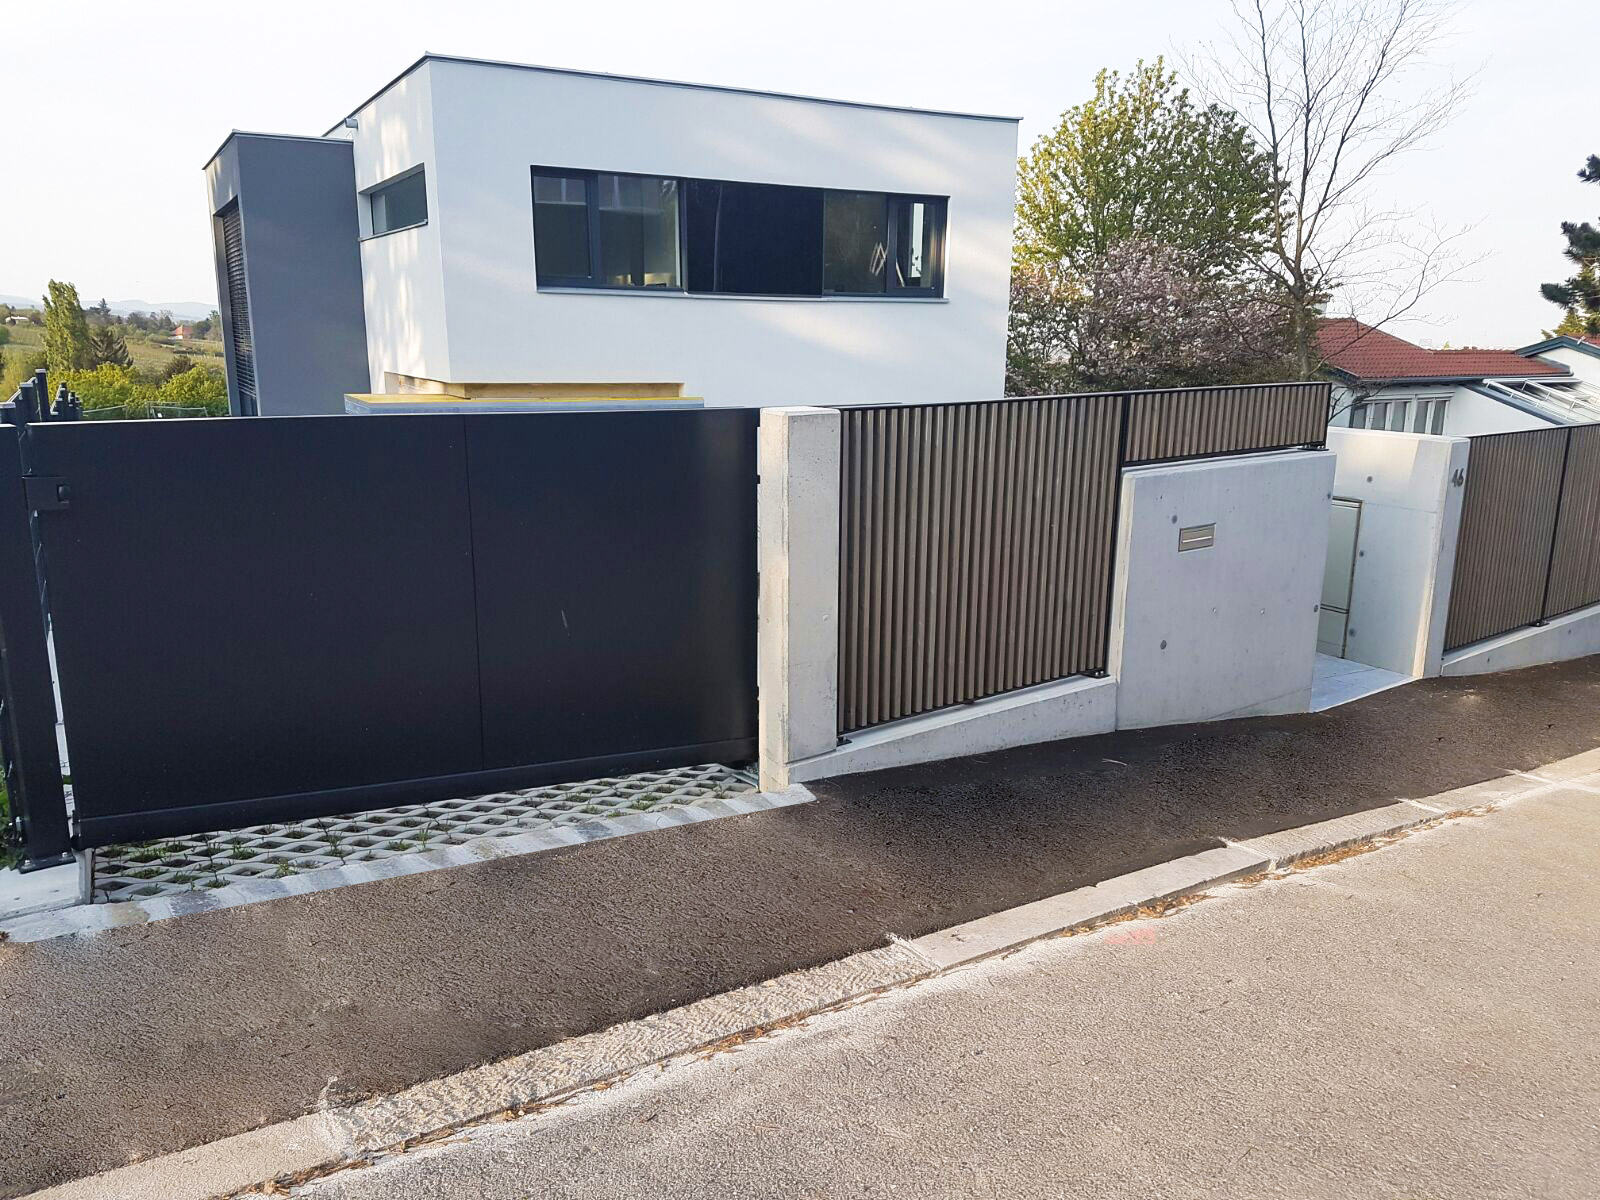 ZA Sonder 01 b | Vollblech-Aluminium-Einfahrtstor, senkrechter Alu-Stab-Zaun, Haus modern | Svoboda